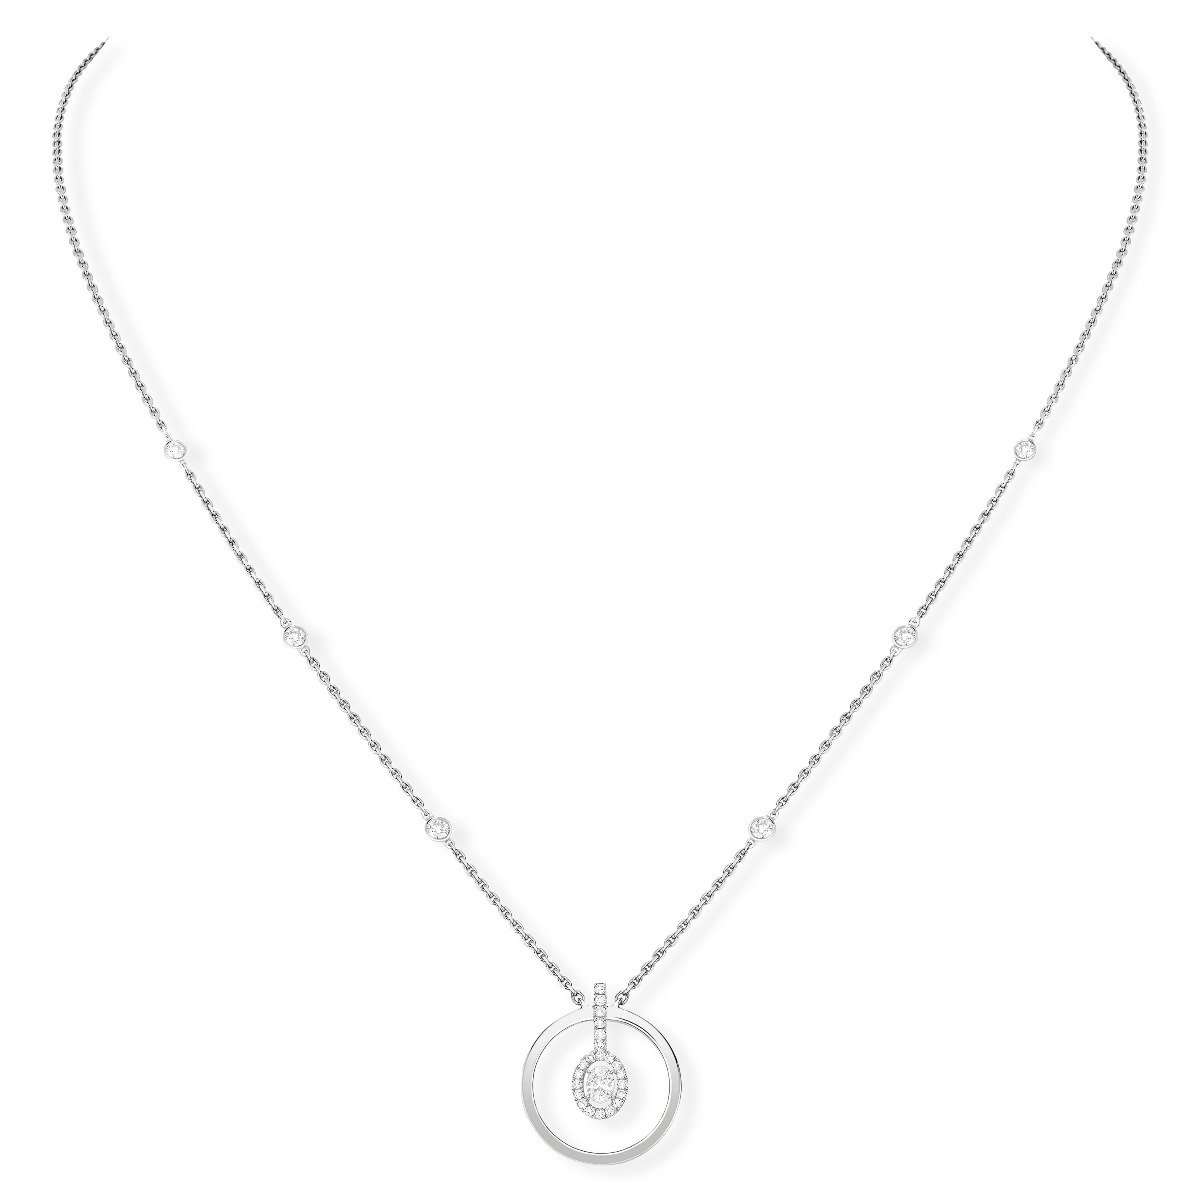 Collier Messika Glam'Azone Graphic en or blanc et diamants vue 1